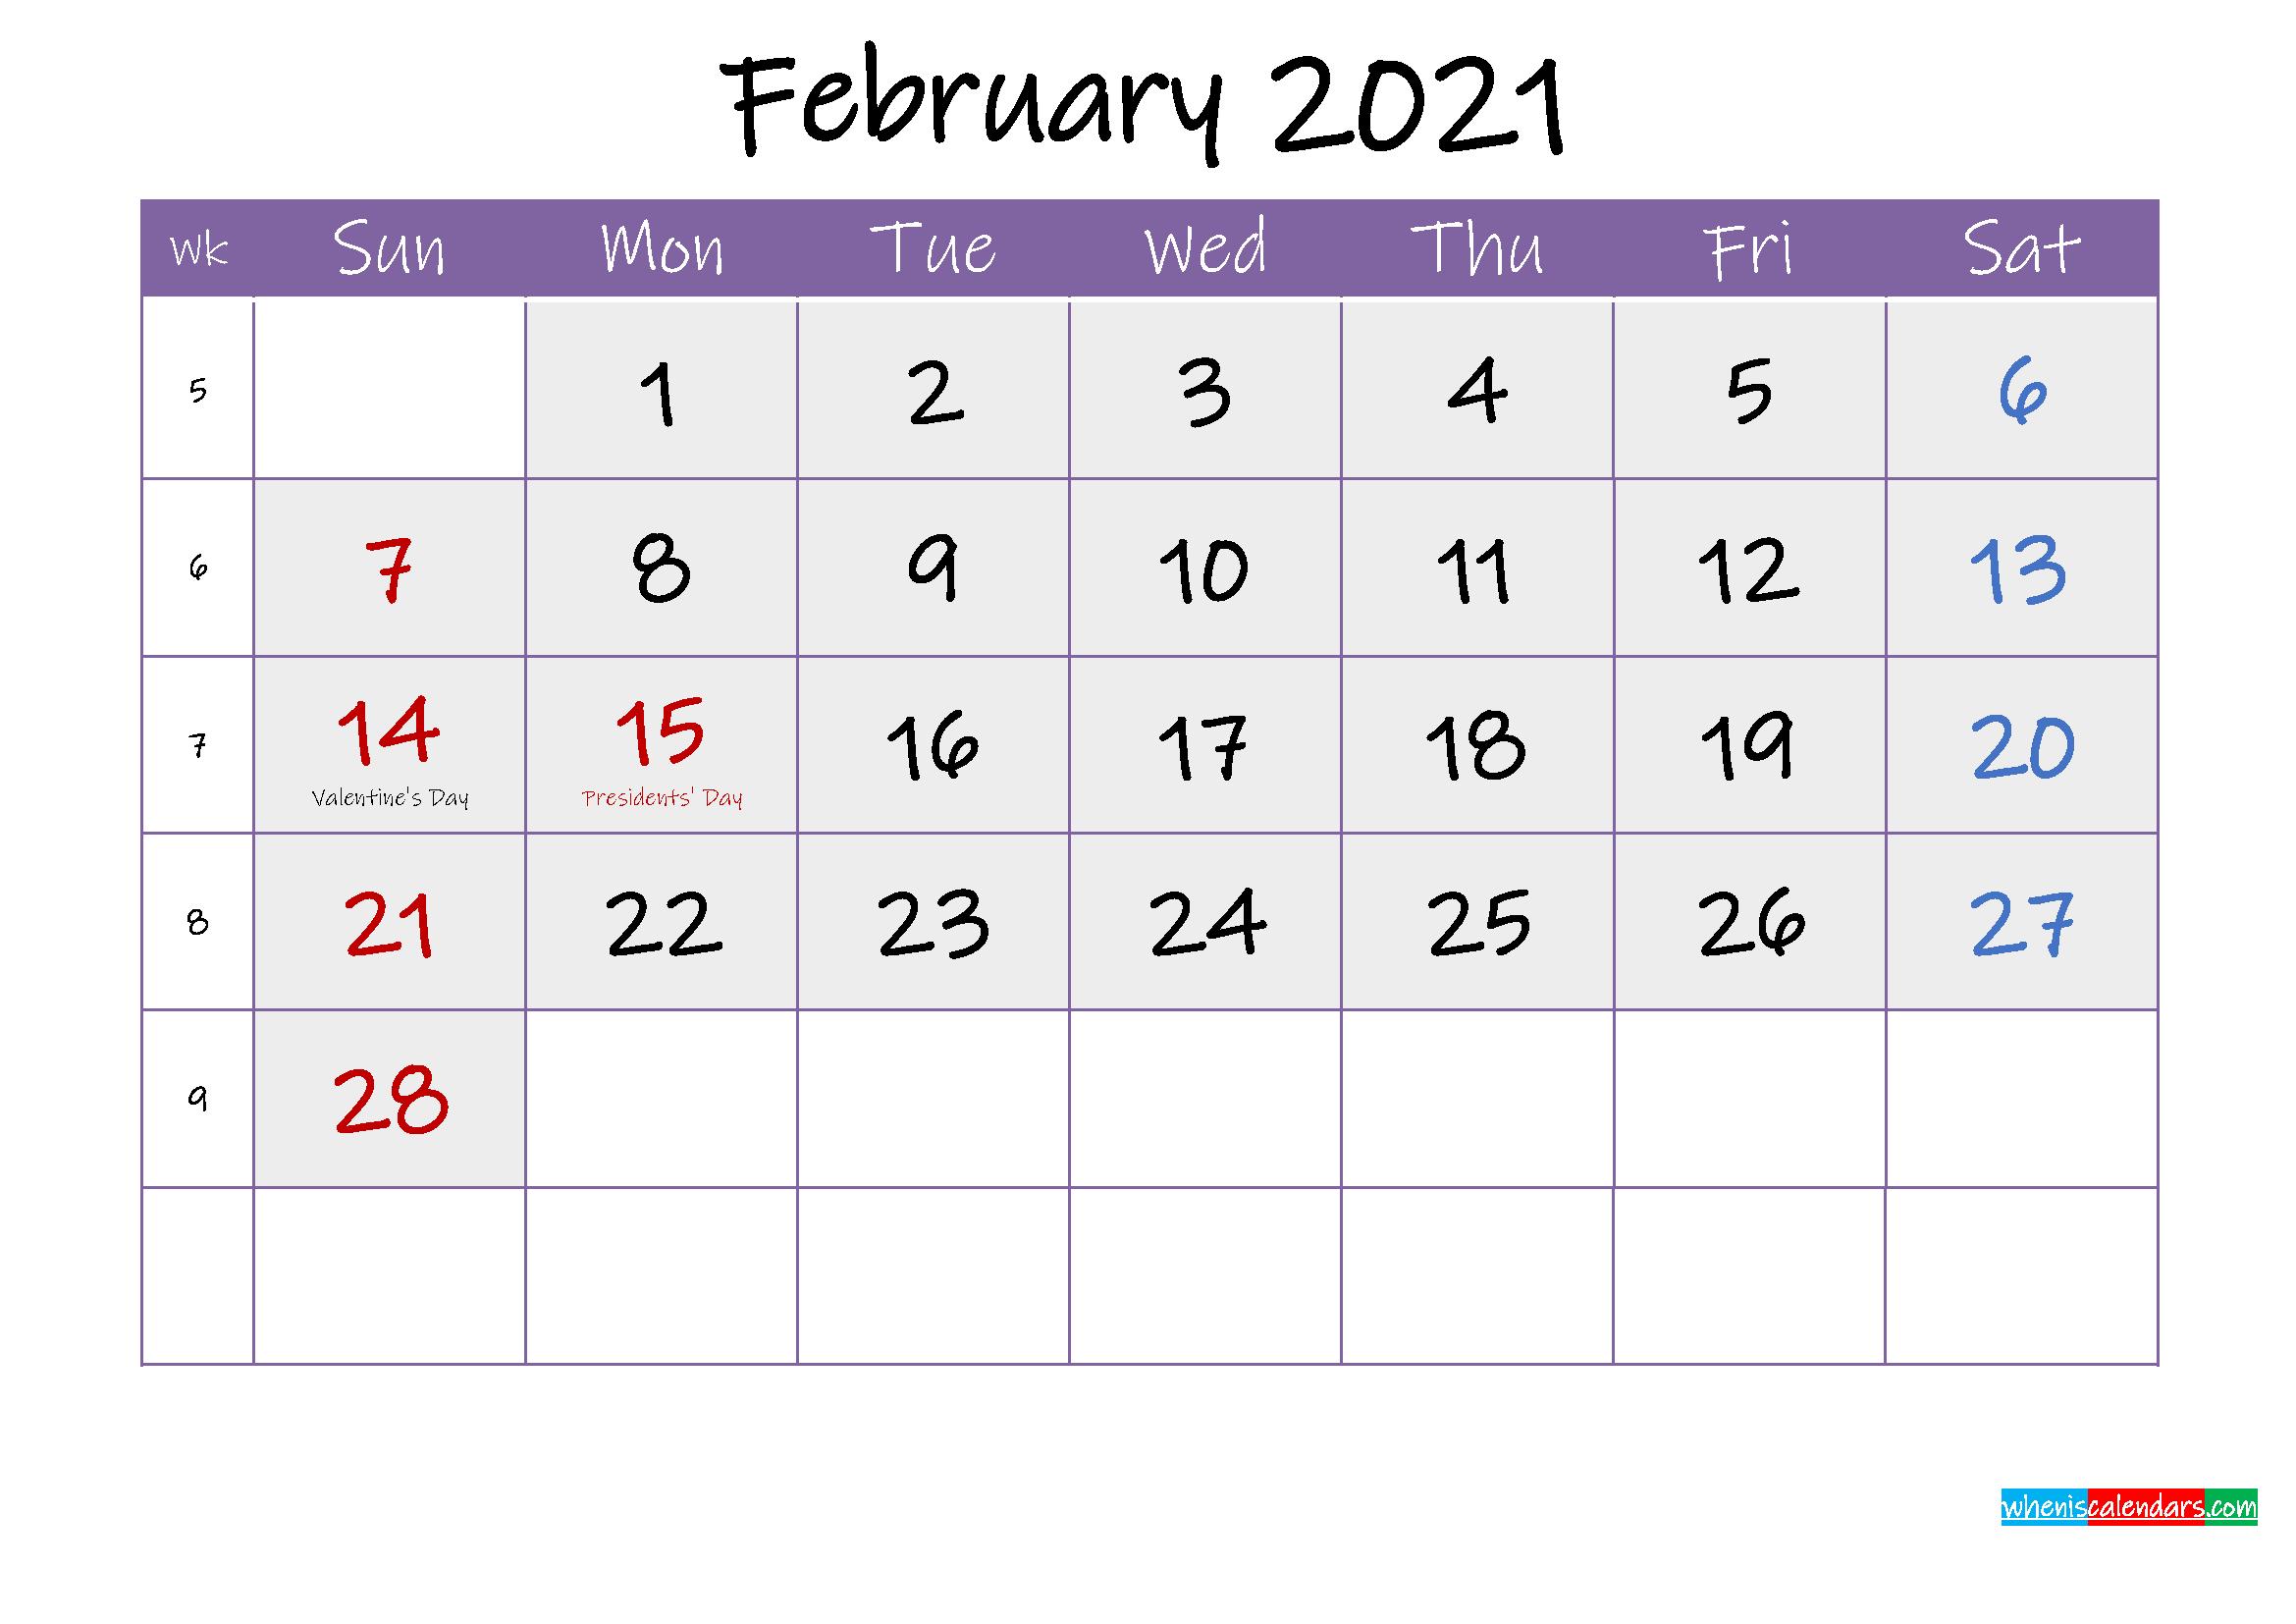 Free February 2021 Printable Calendar With Holidays  February 2021 Calendar